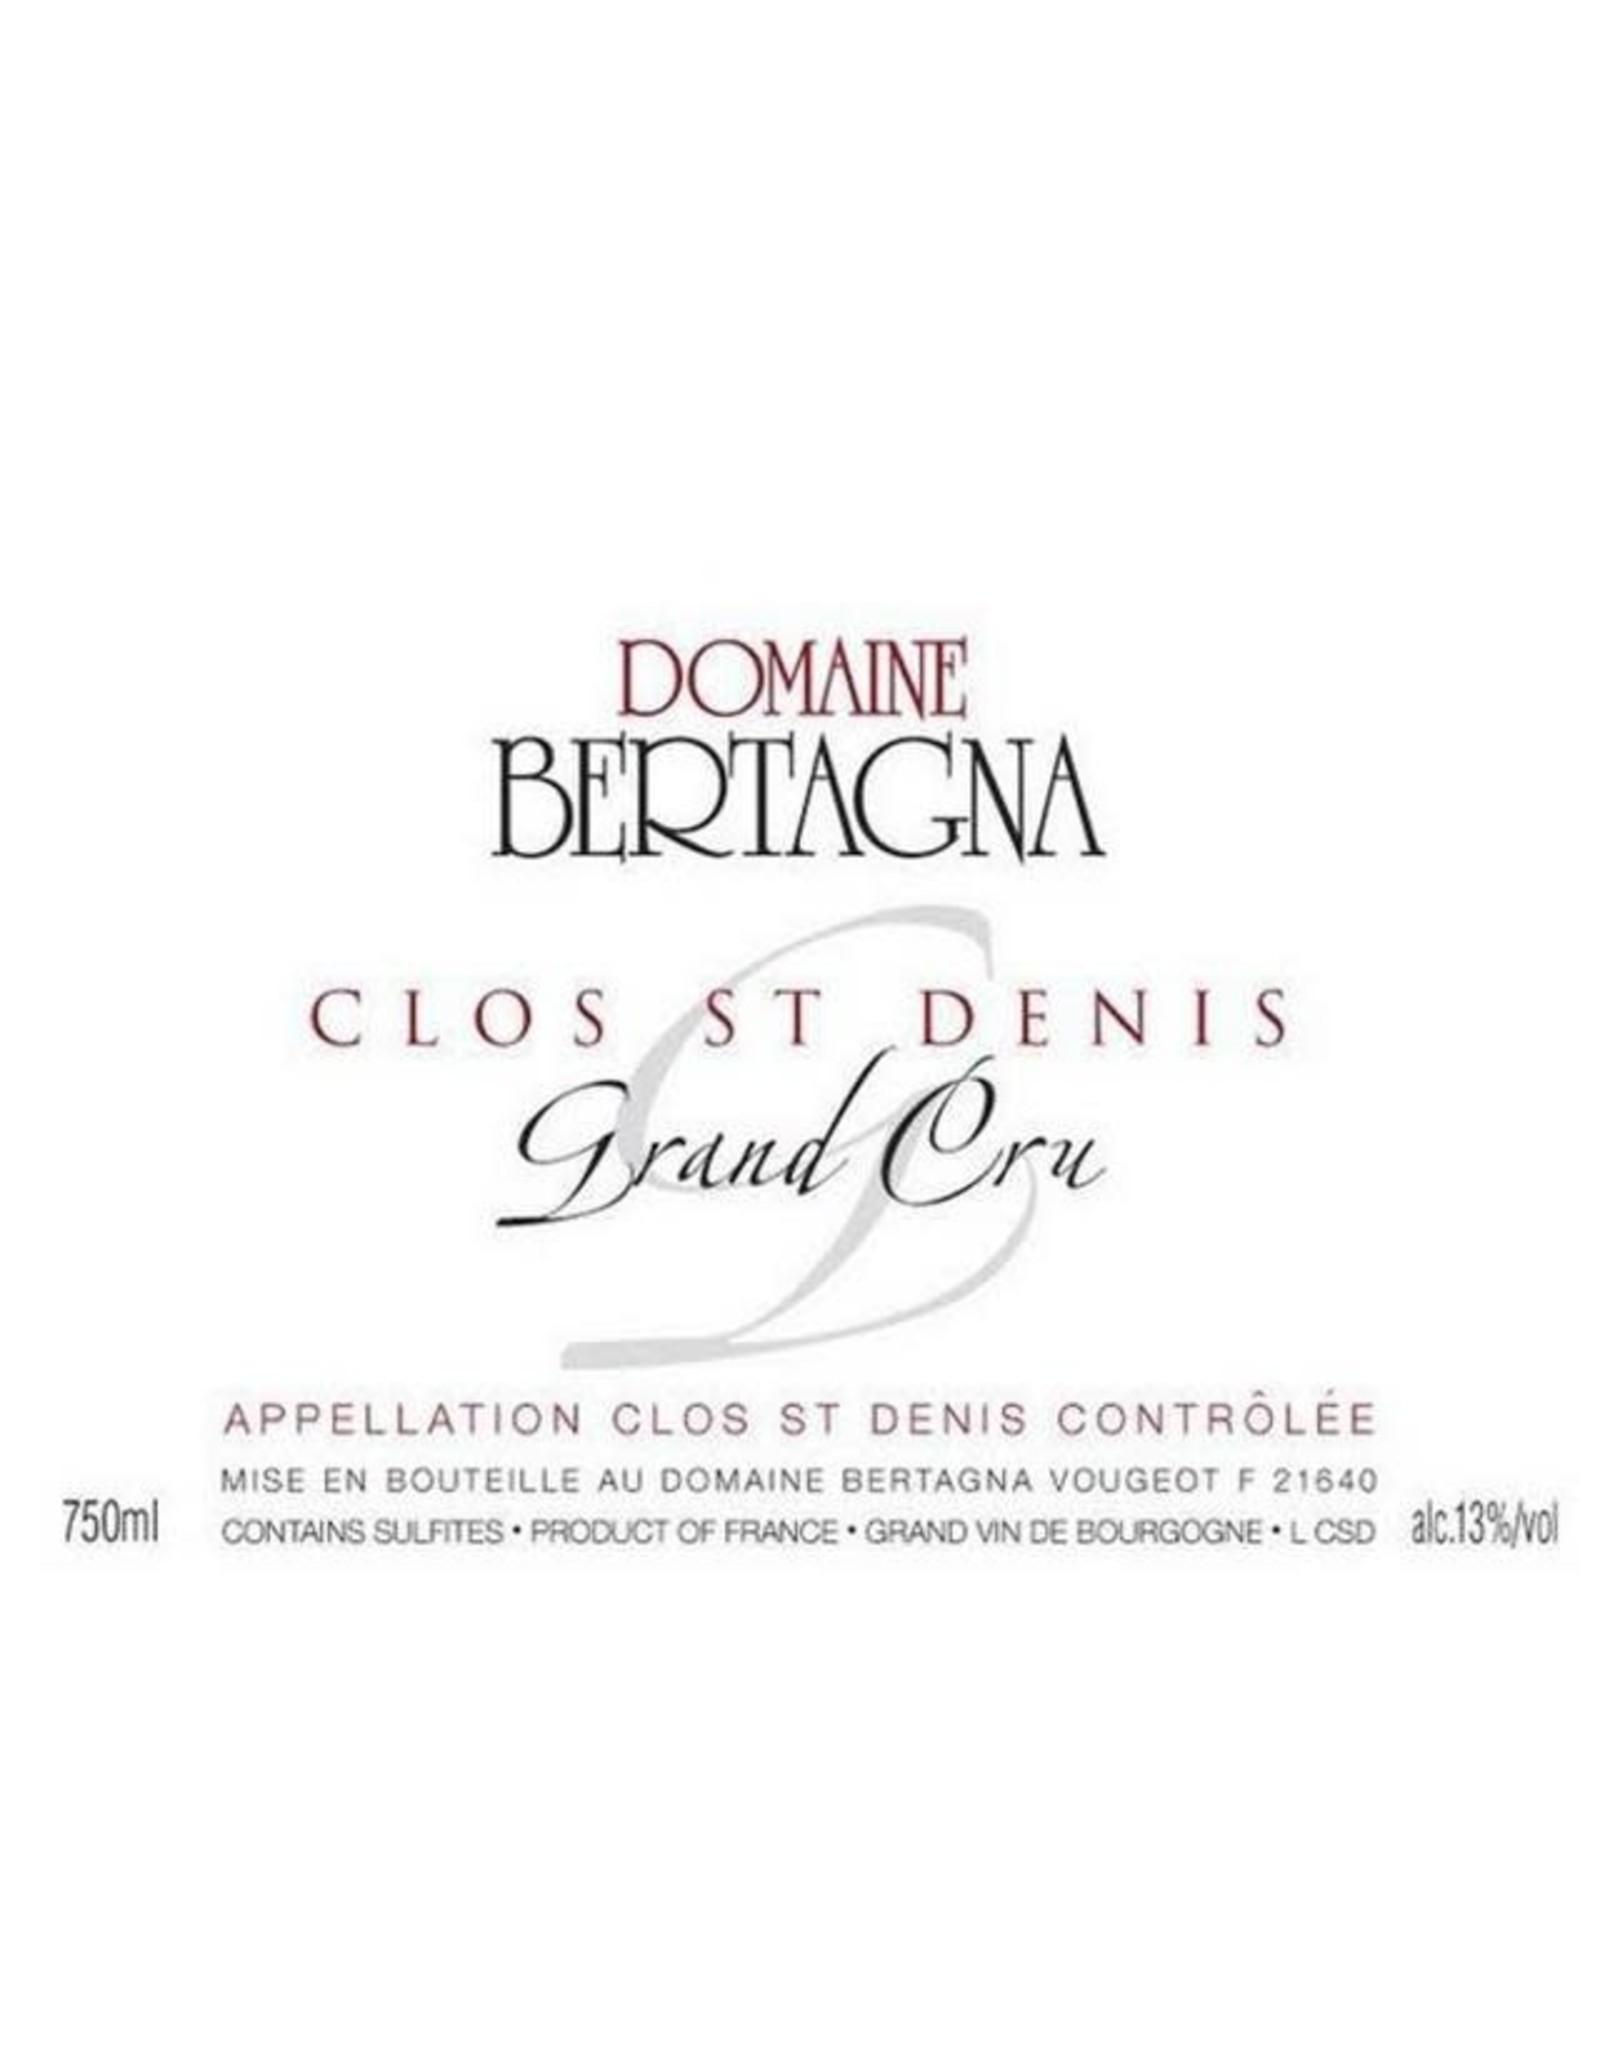 DOMANIN BERTAGNA CLOS SAINT DENIS 2006 750ML